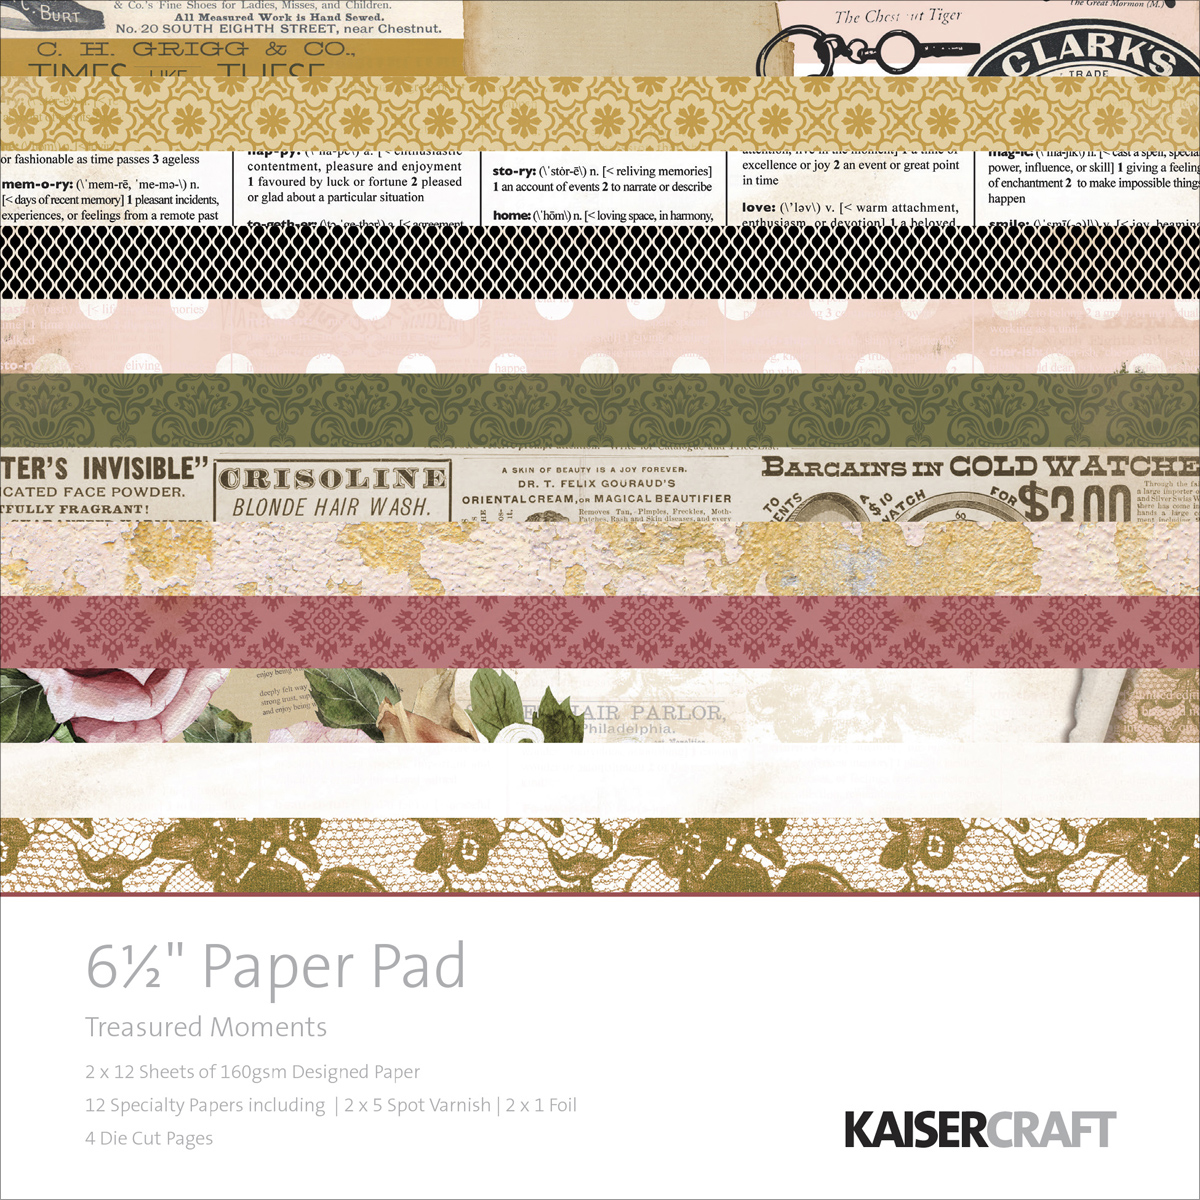 KaiserCraft 6.5 x 6.5 Paper Pad Treasured Moments